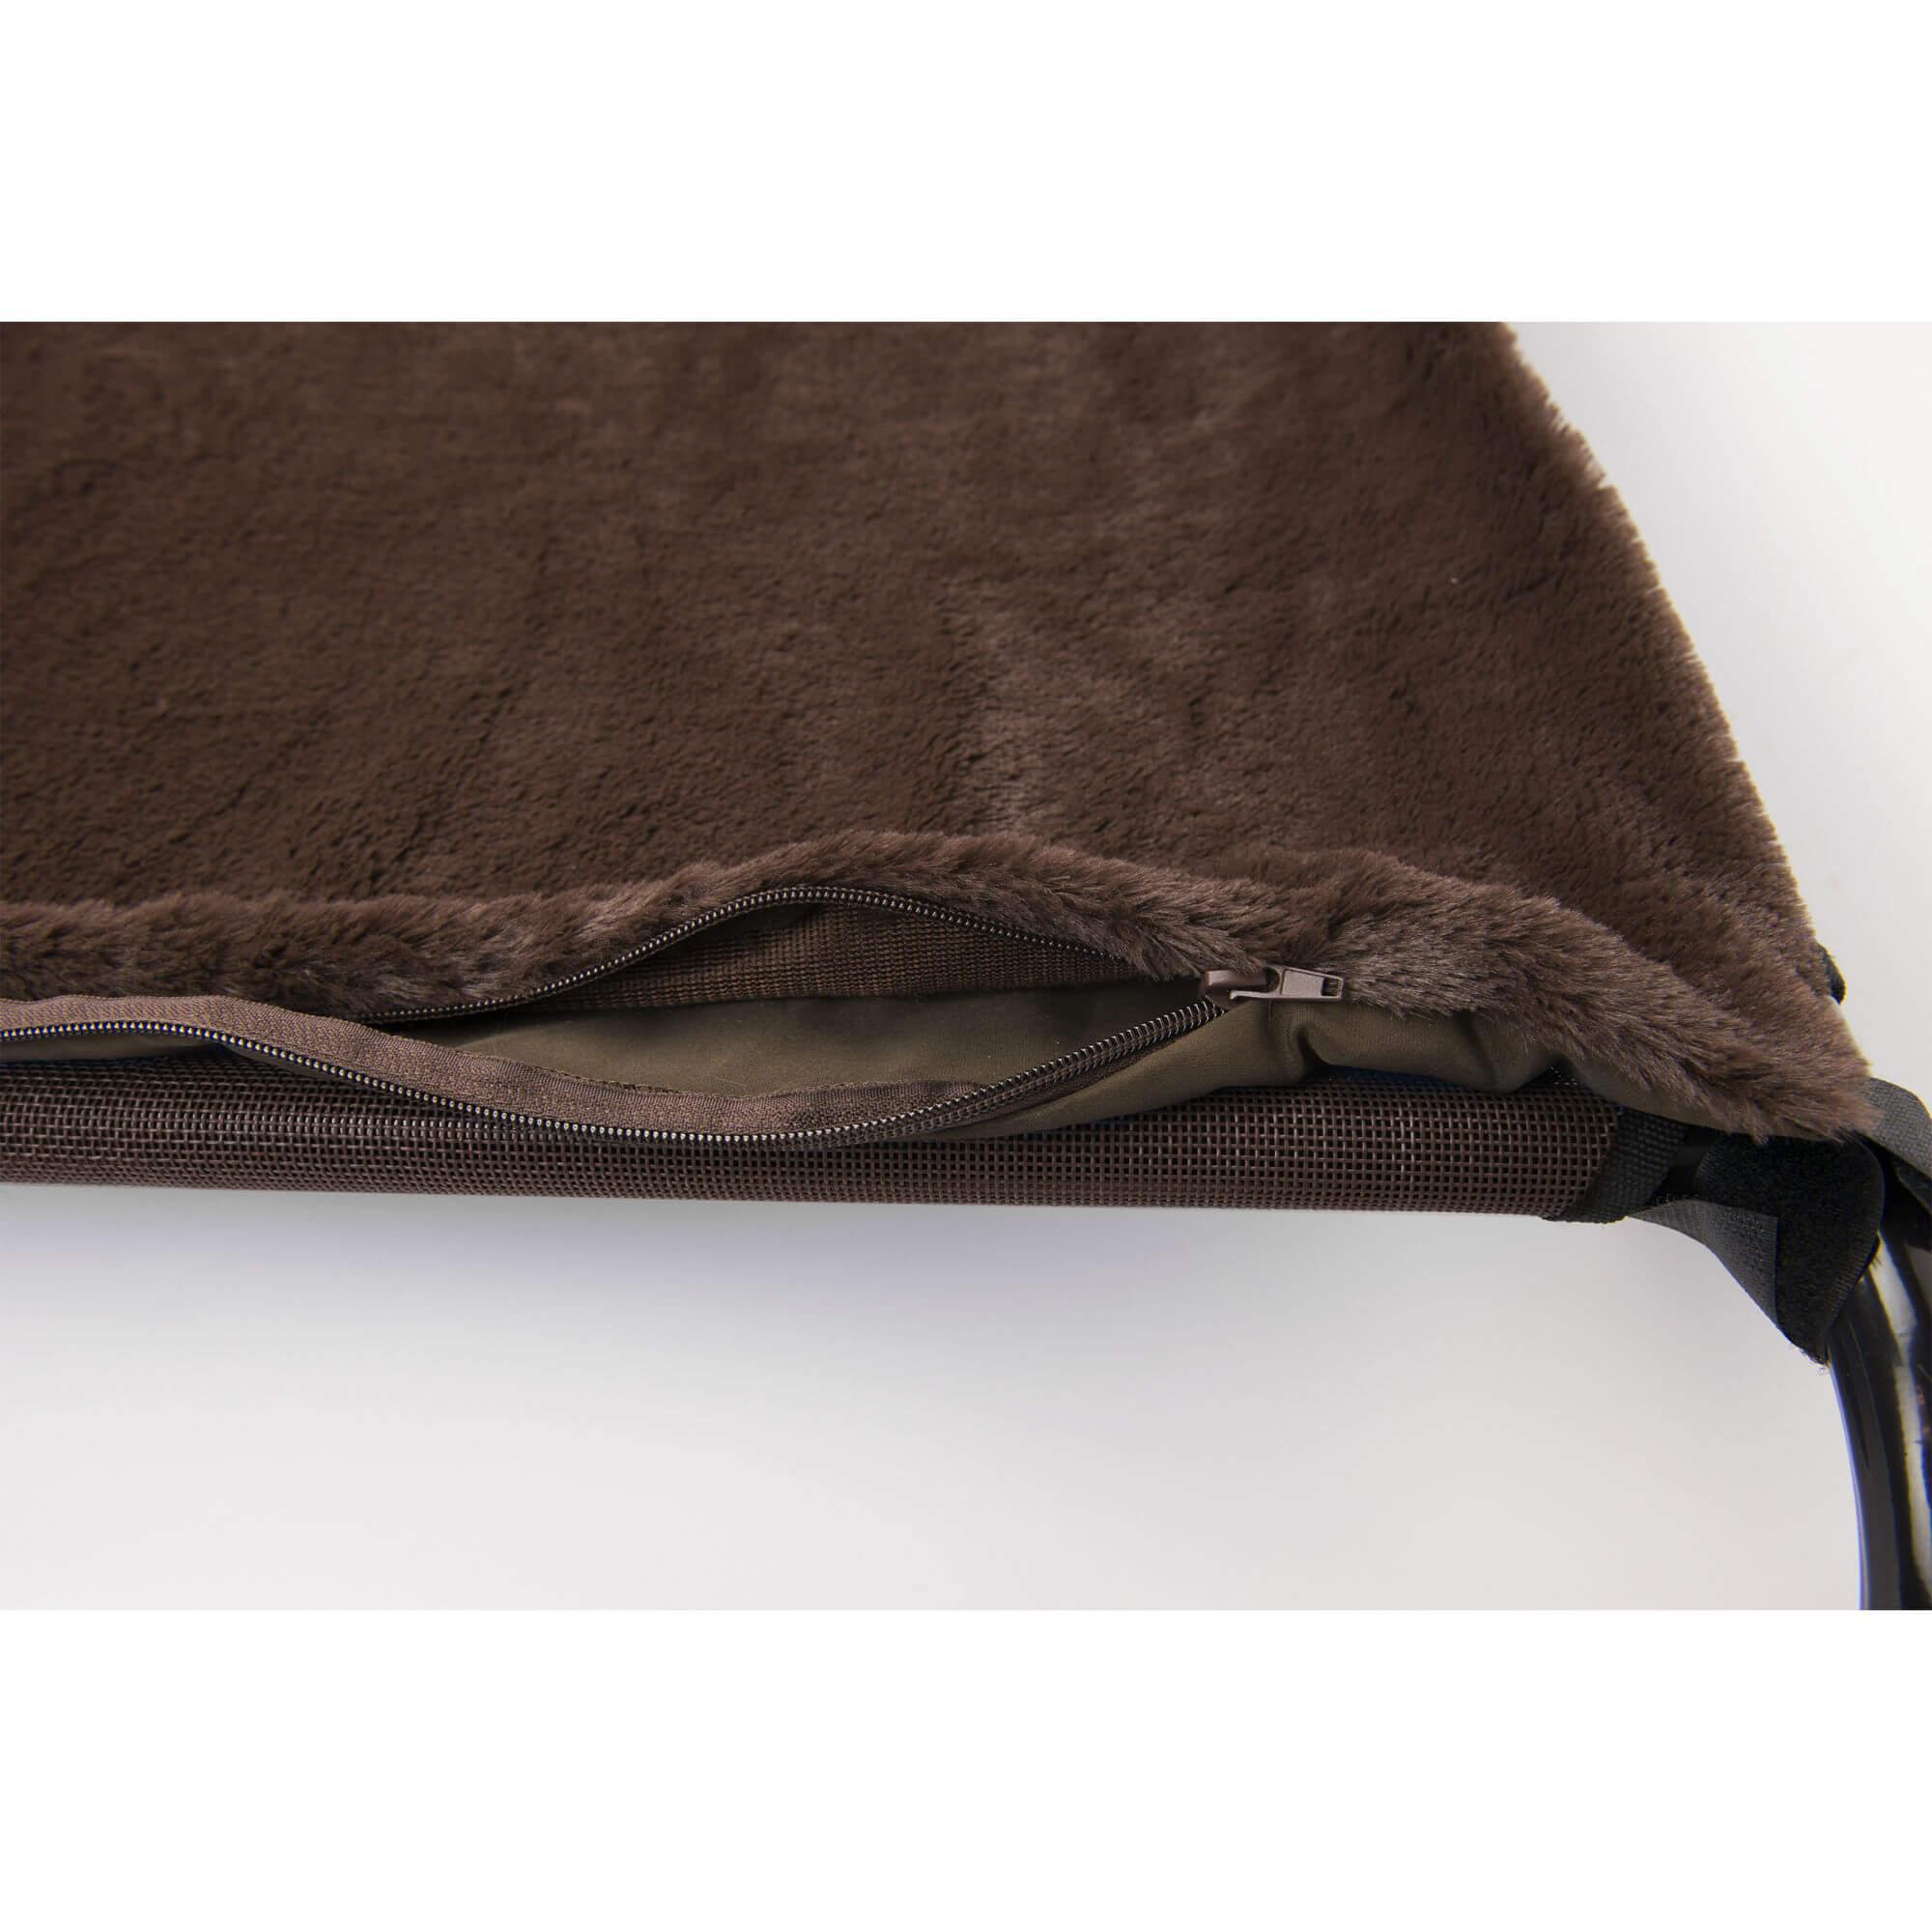 FurHaven Plush Pet Cot Blanket - Espresso